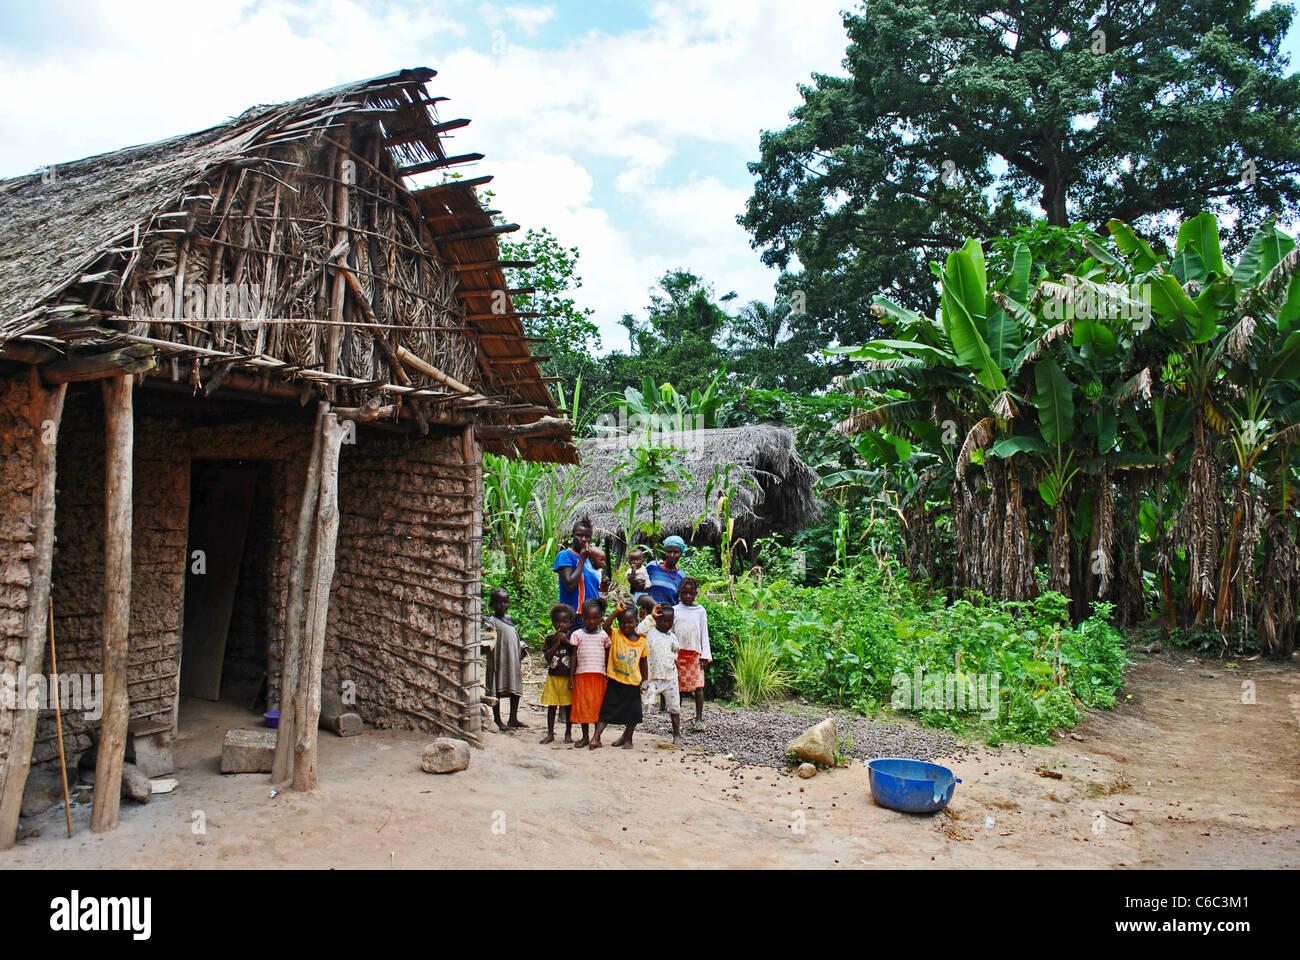 Children in a small village between Kolahun and Bolahun in Lofa County, Liberia - Stock Image